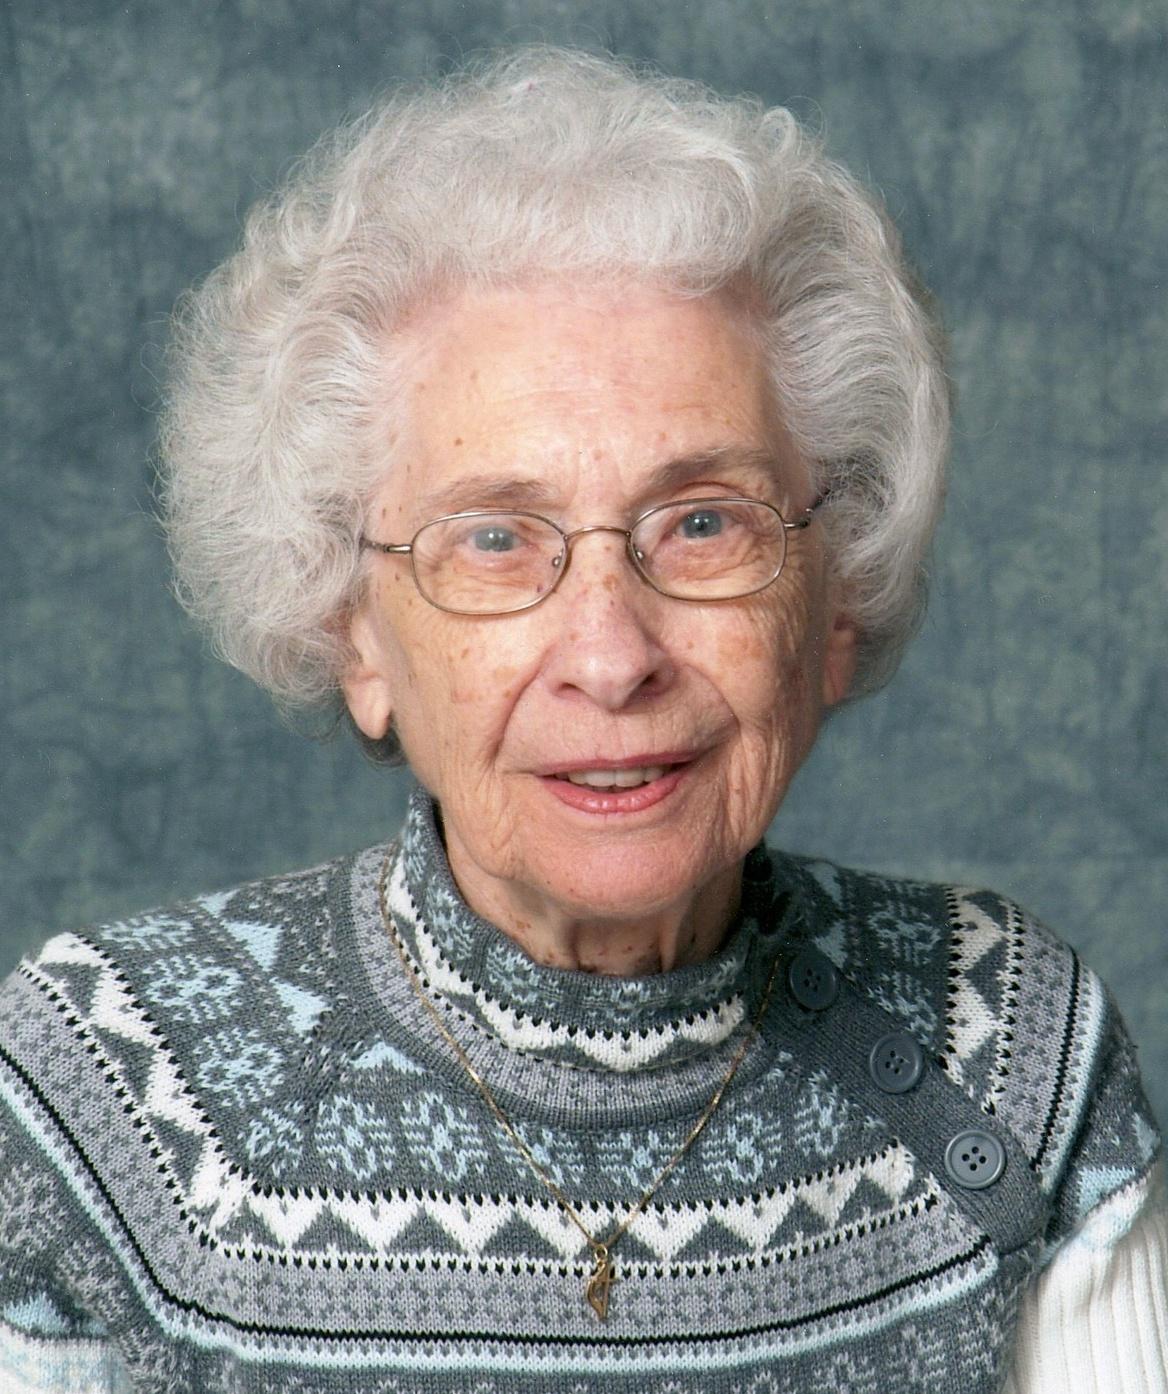 Obituary Naomi Lee Morrison